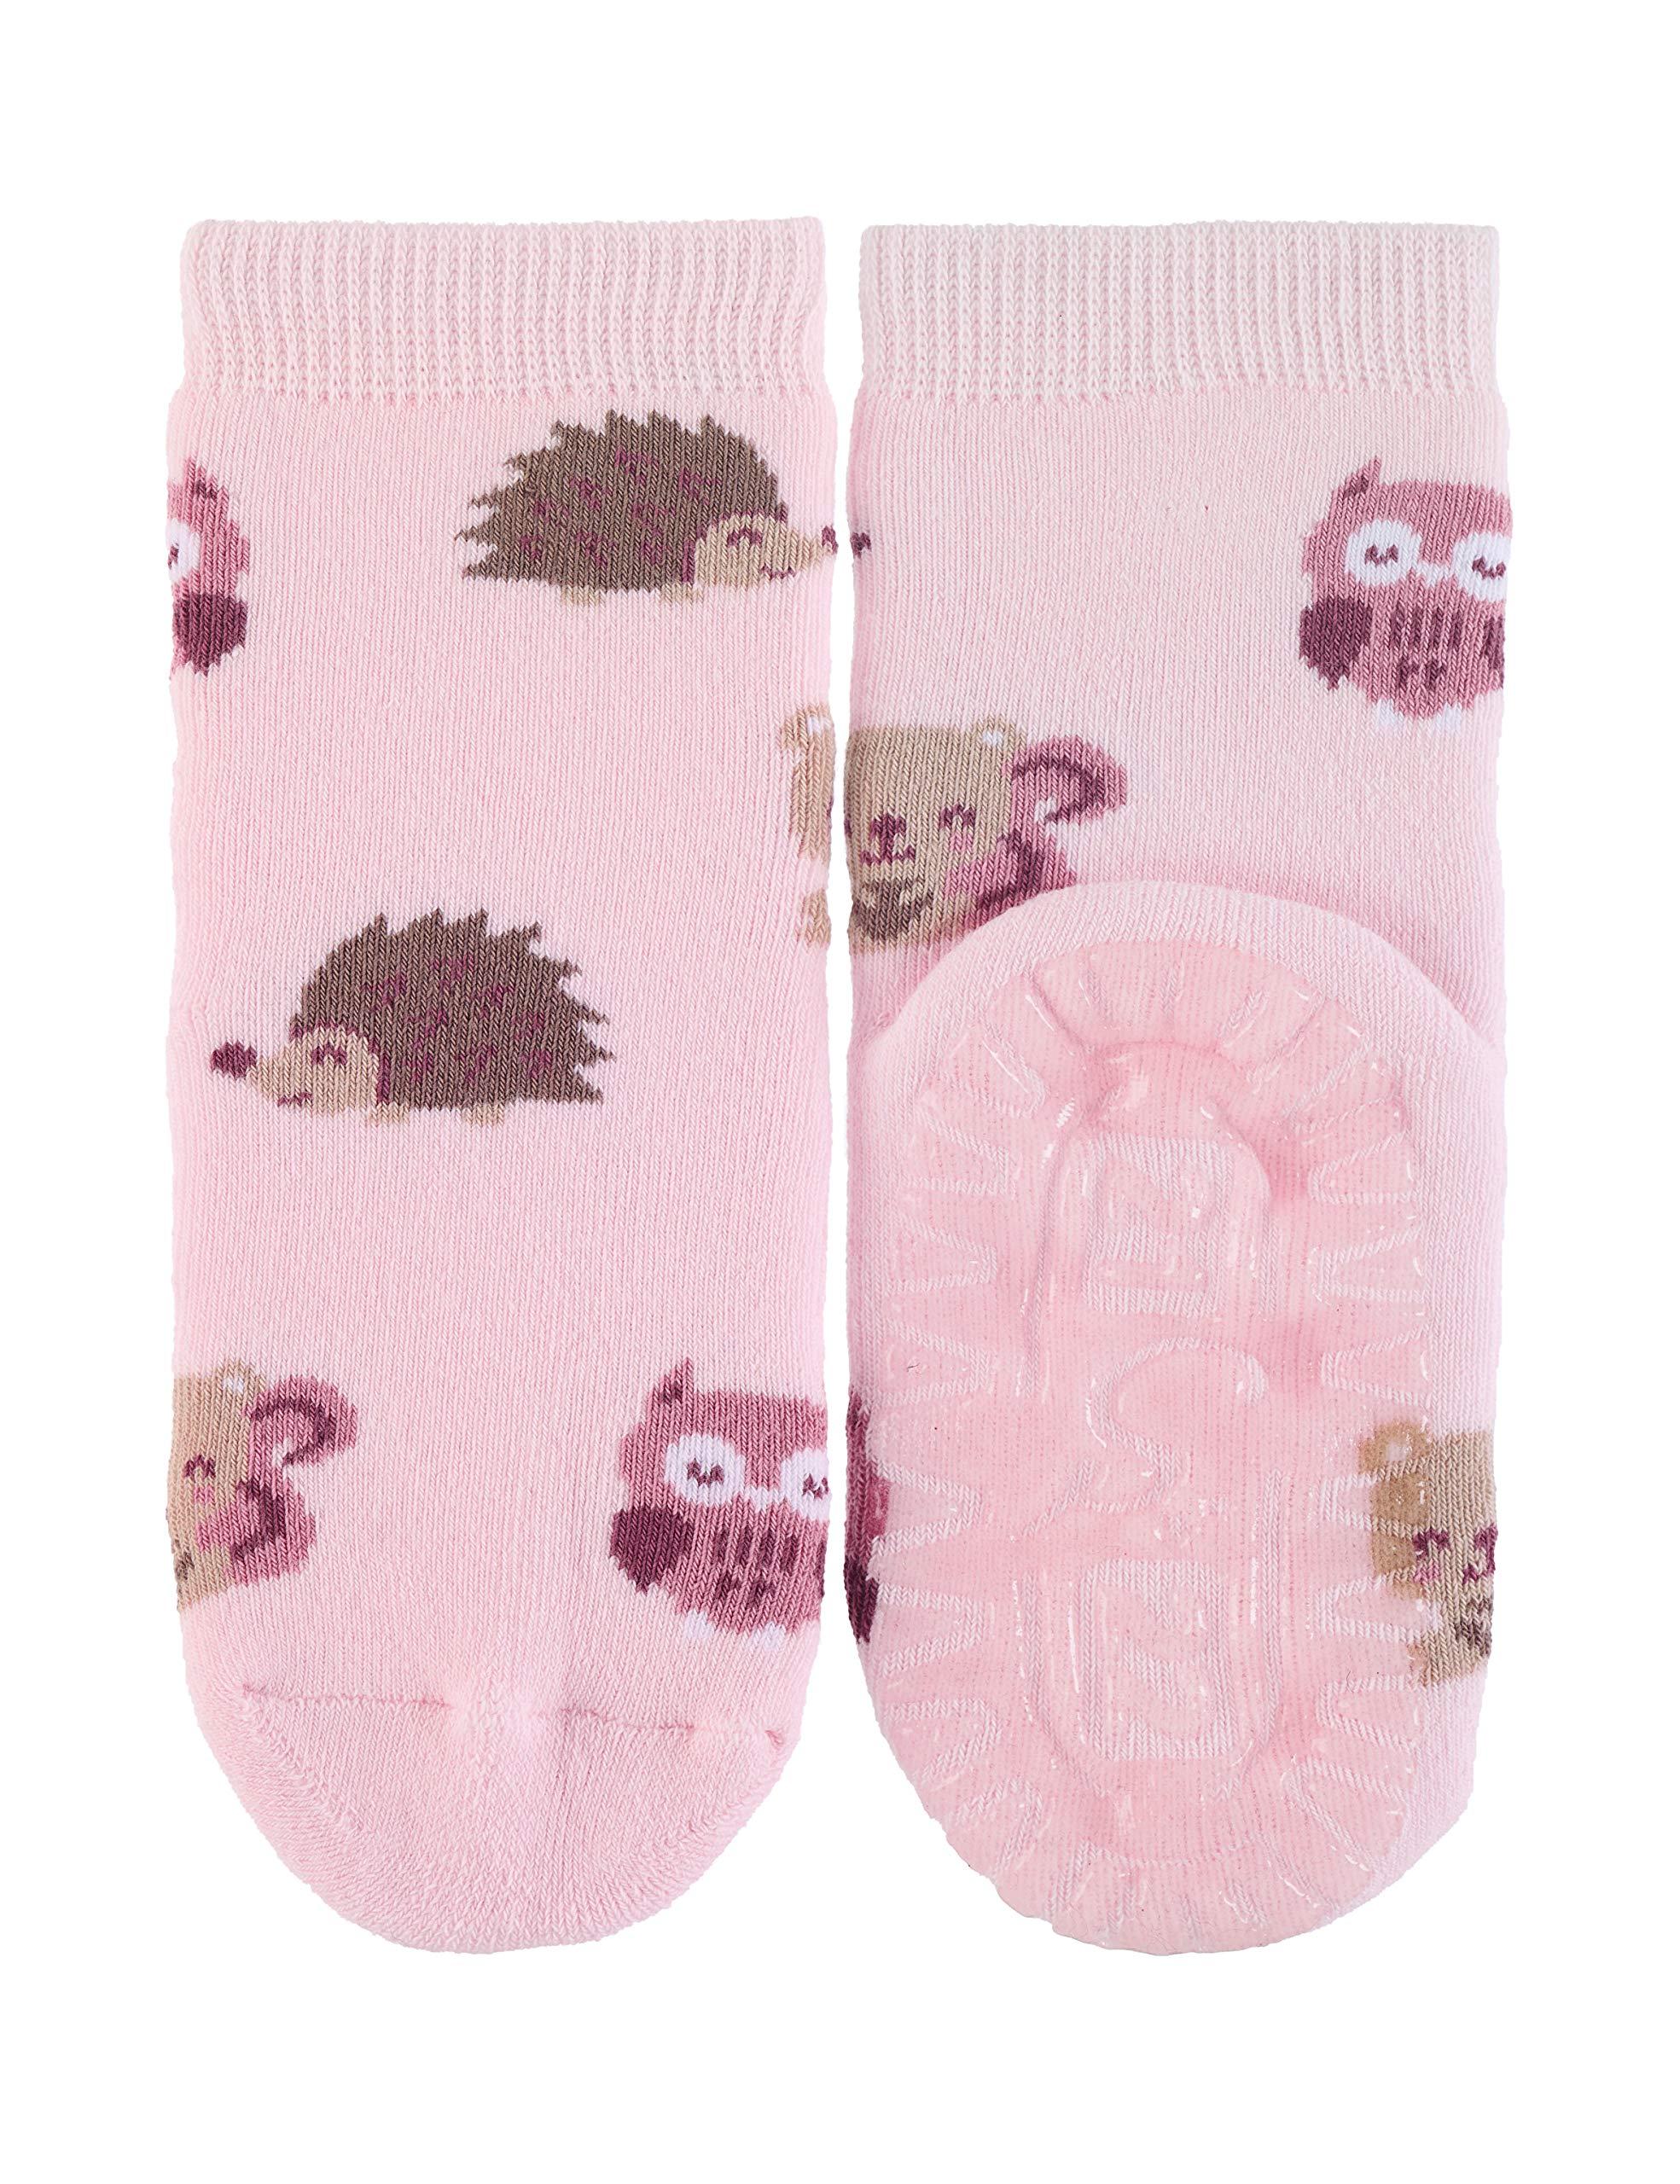 Sterntaler Fli Soft Calcetines, para Bebés 4